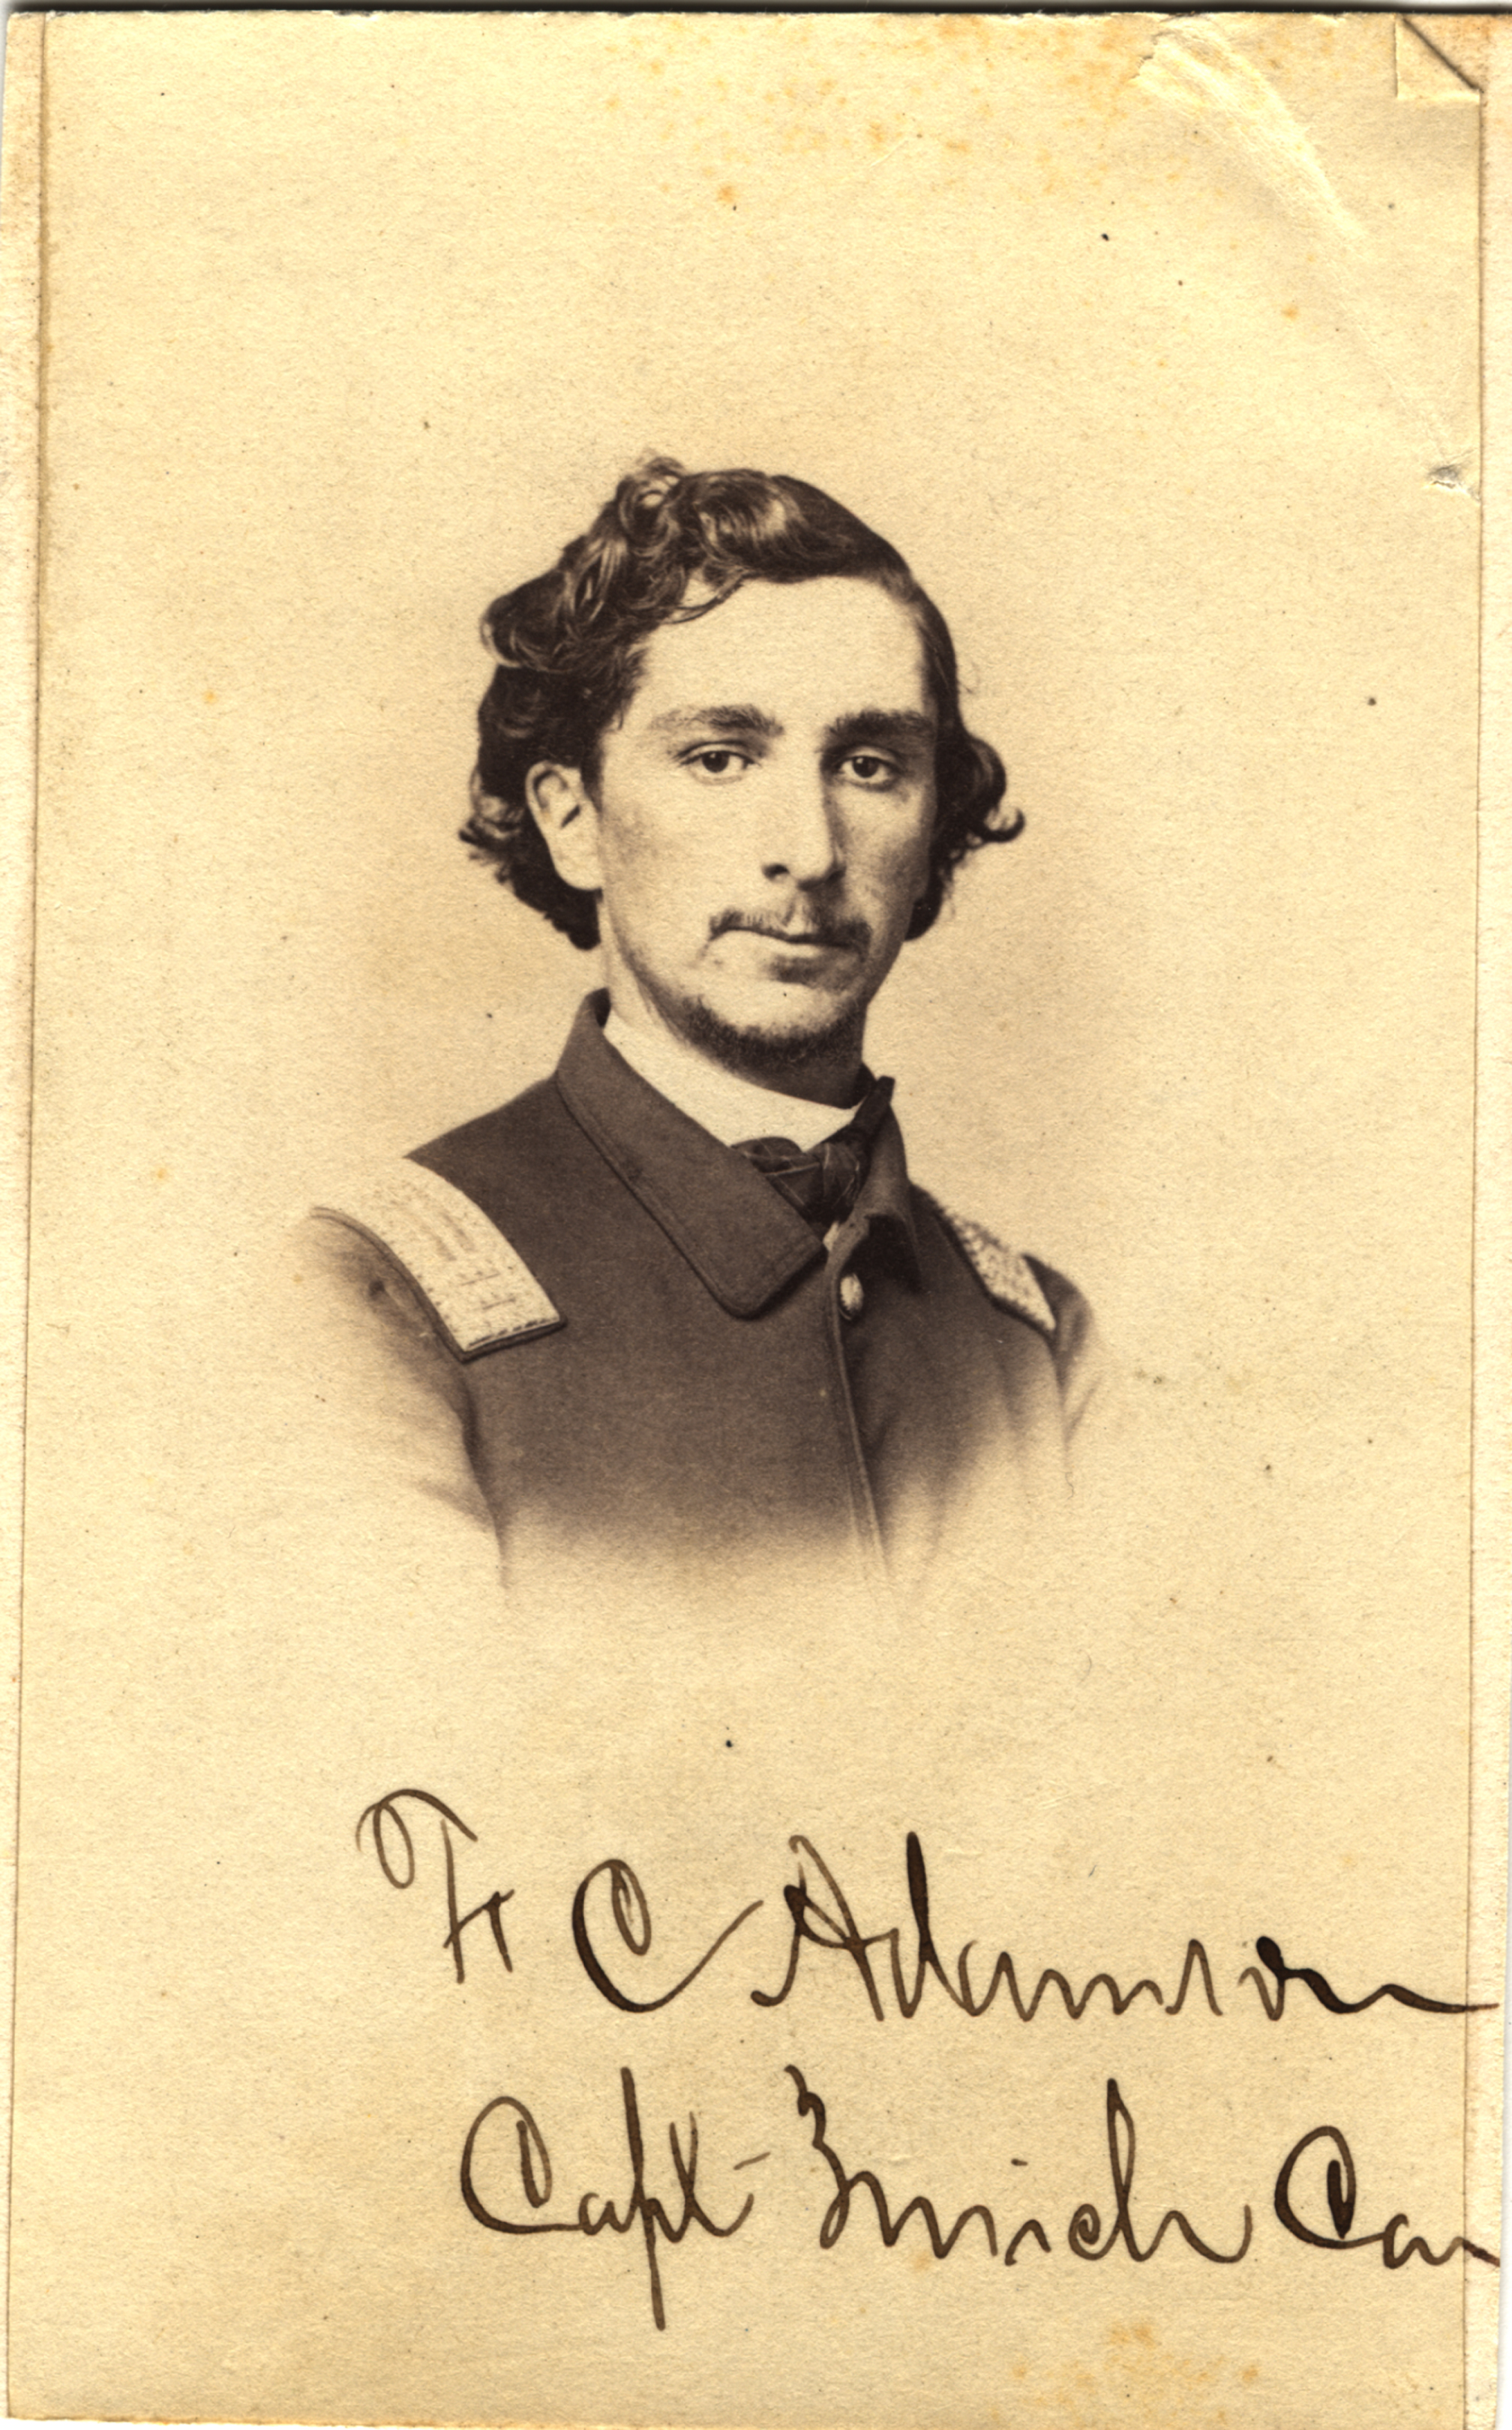 Frederick C. Adamson, circa 1860s